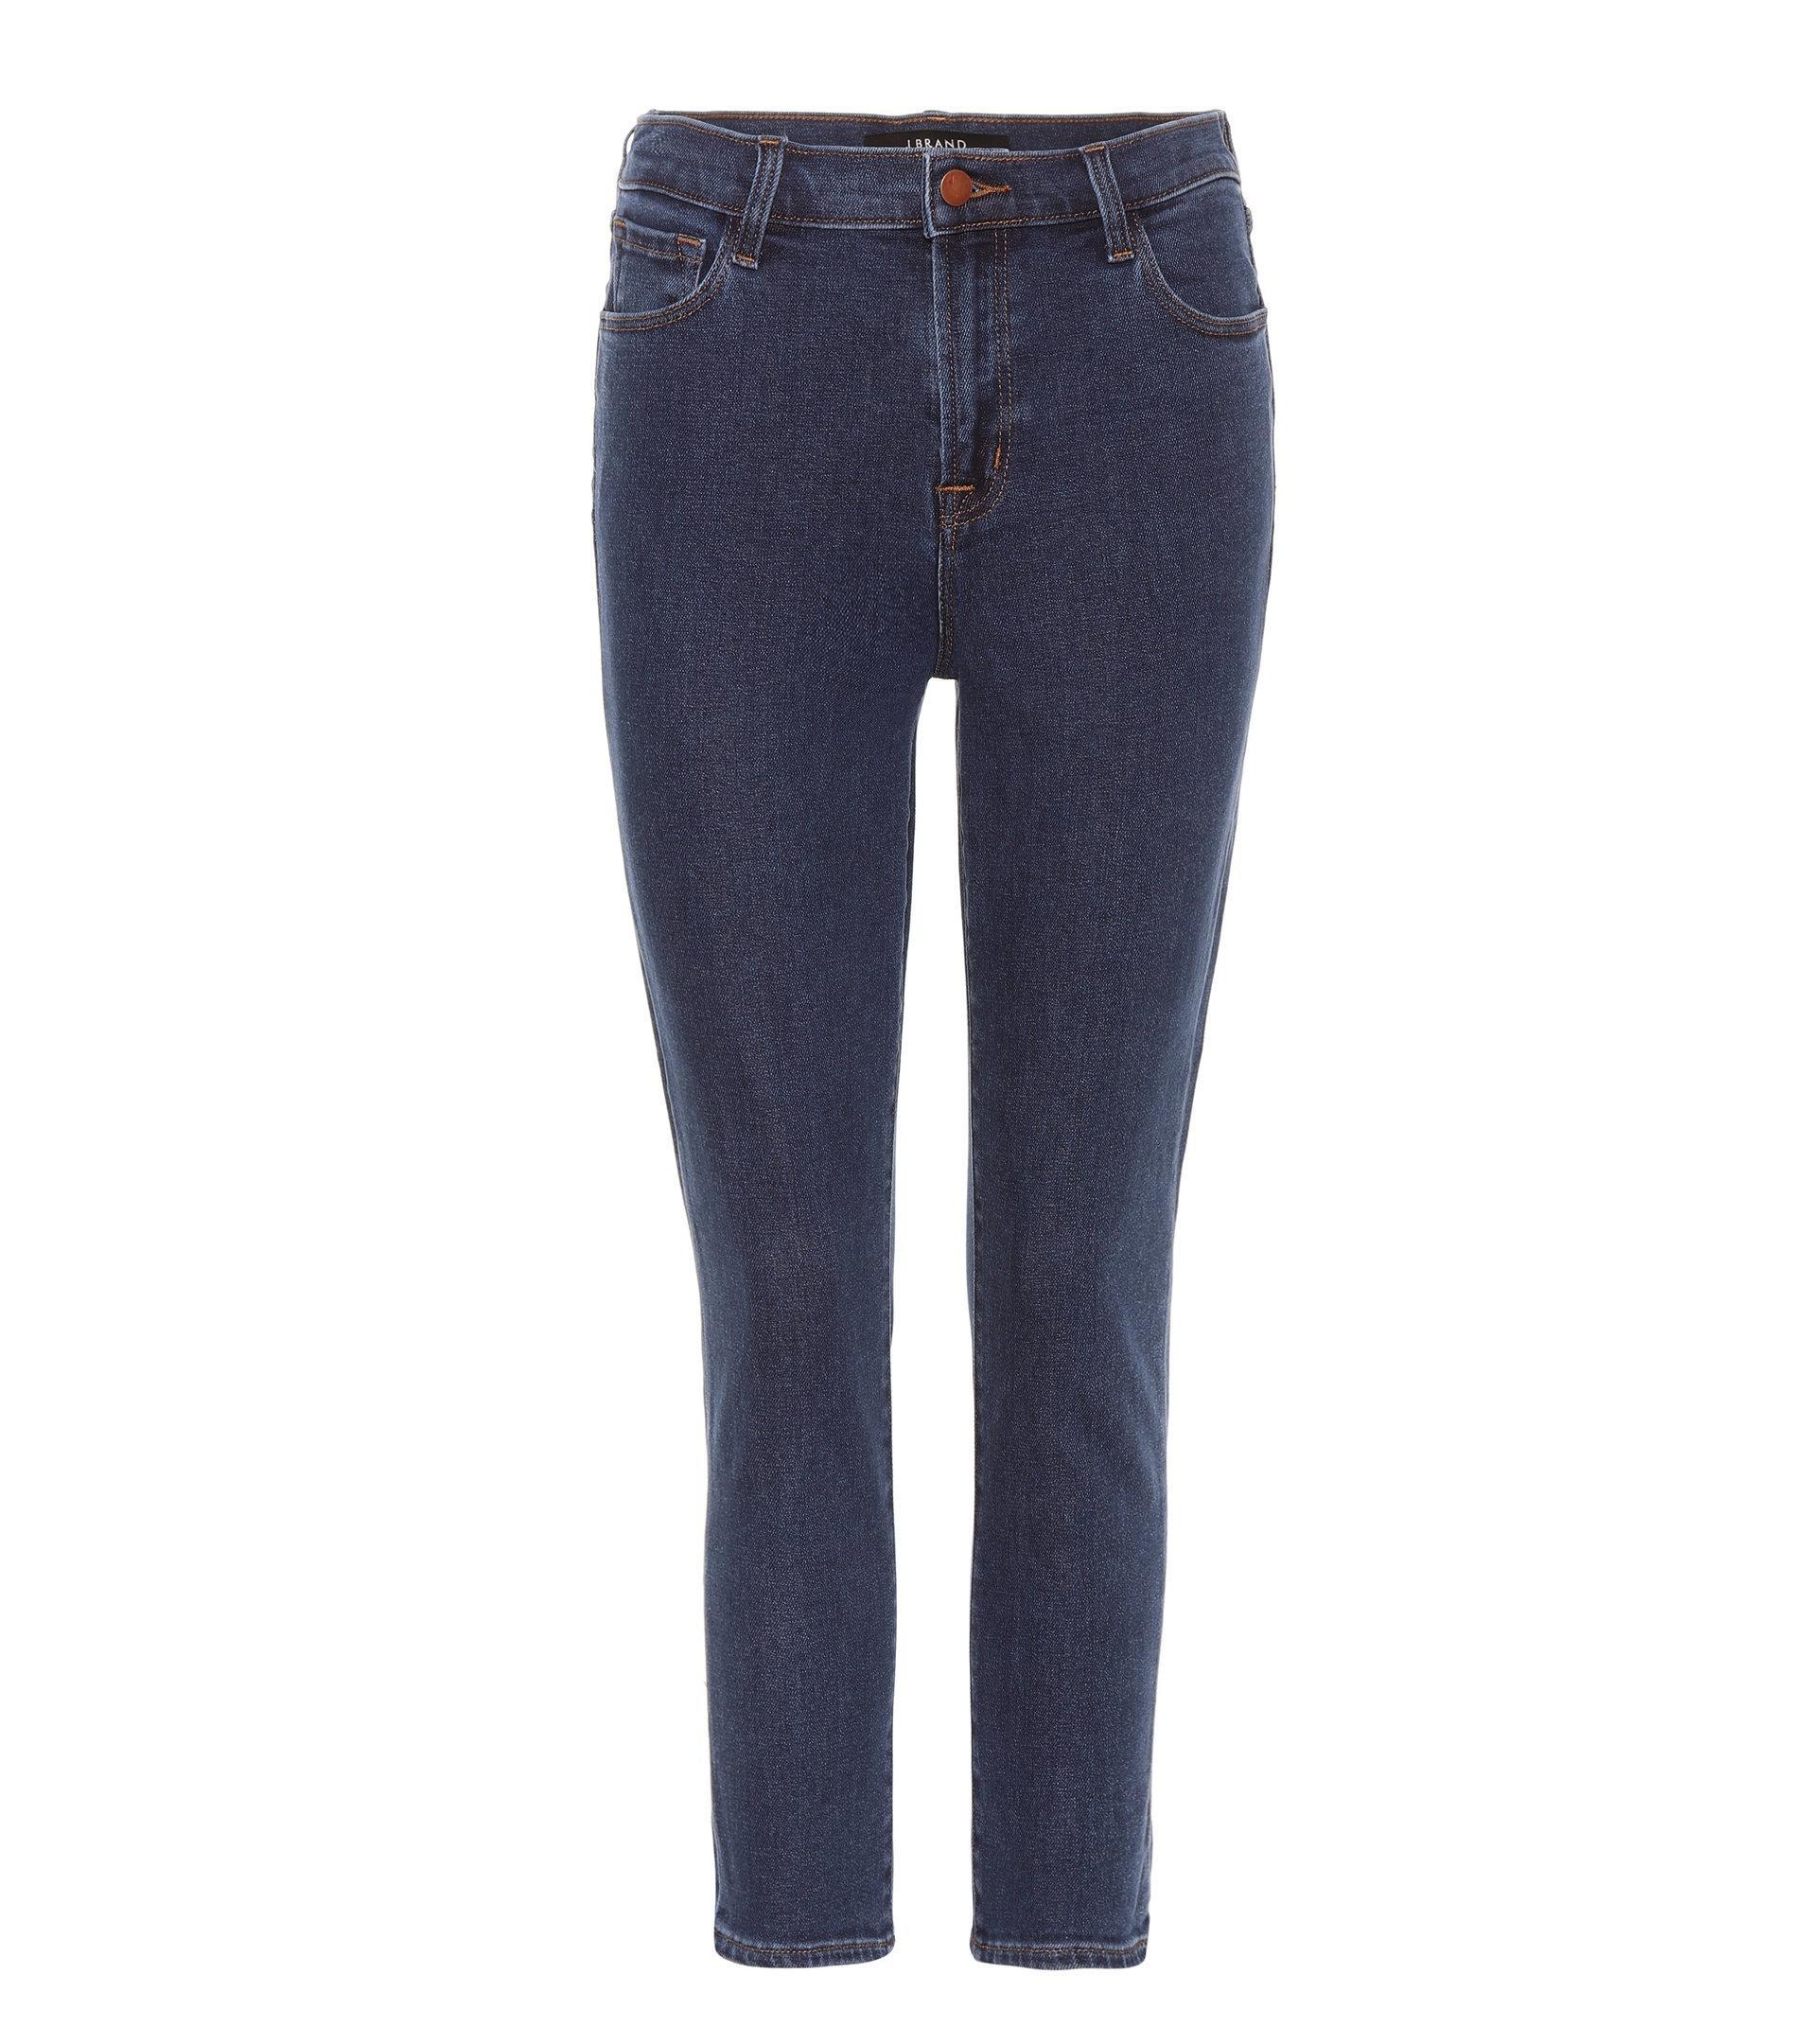 20465e9884ce J Brand Ruby High-rise Crop Jeans in Blue - Lyst